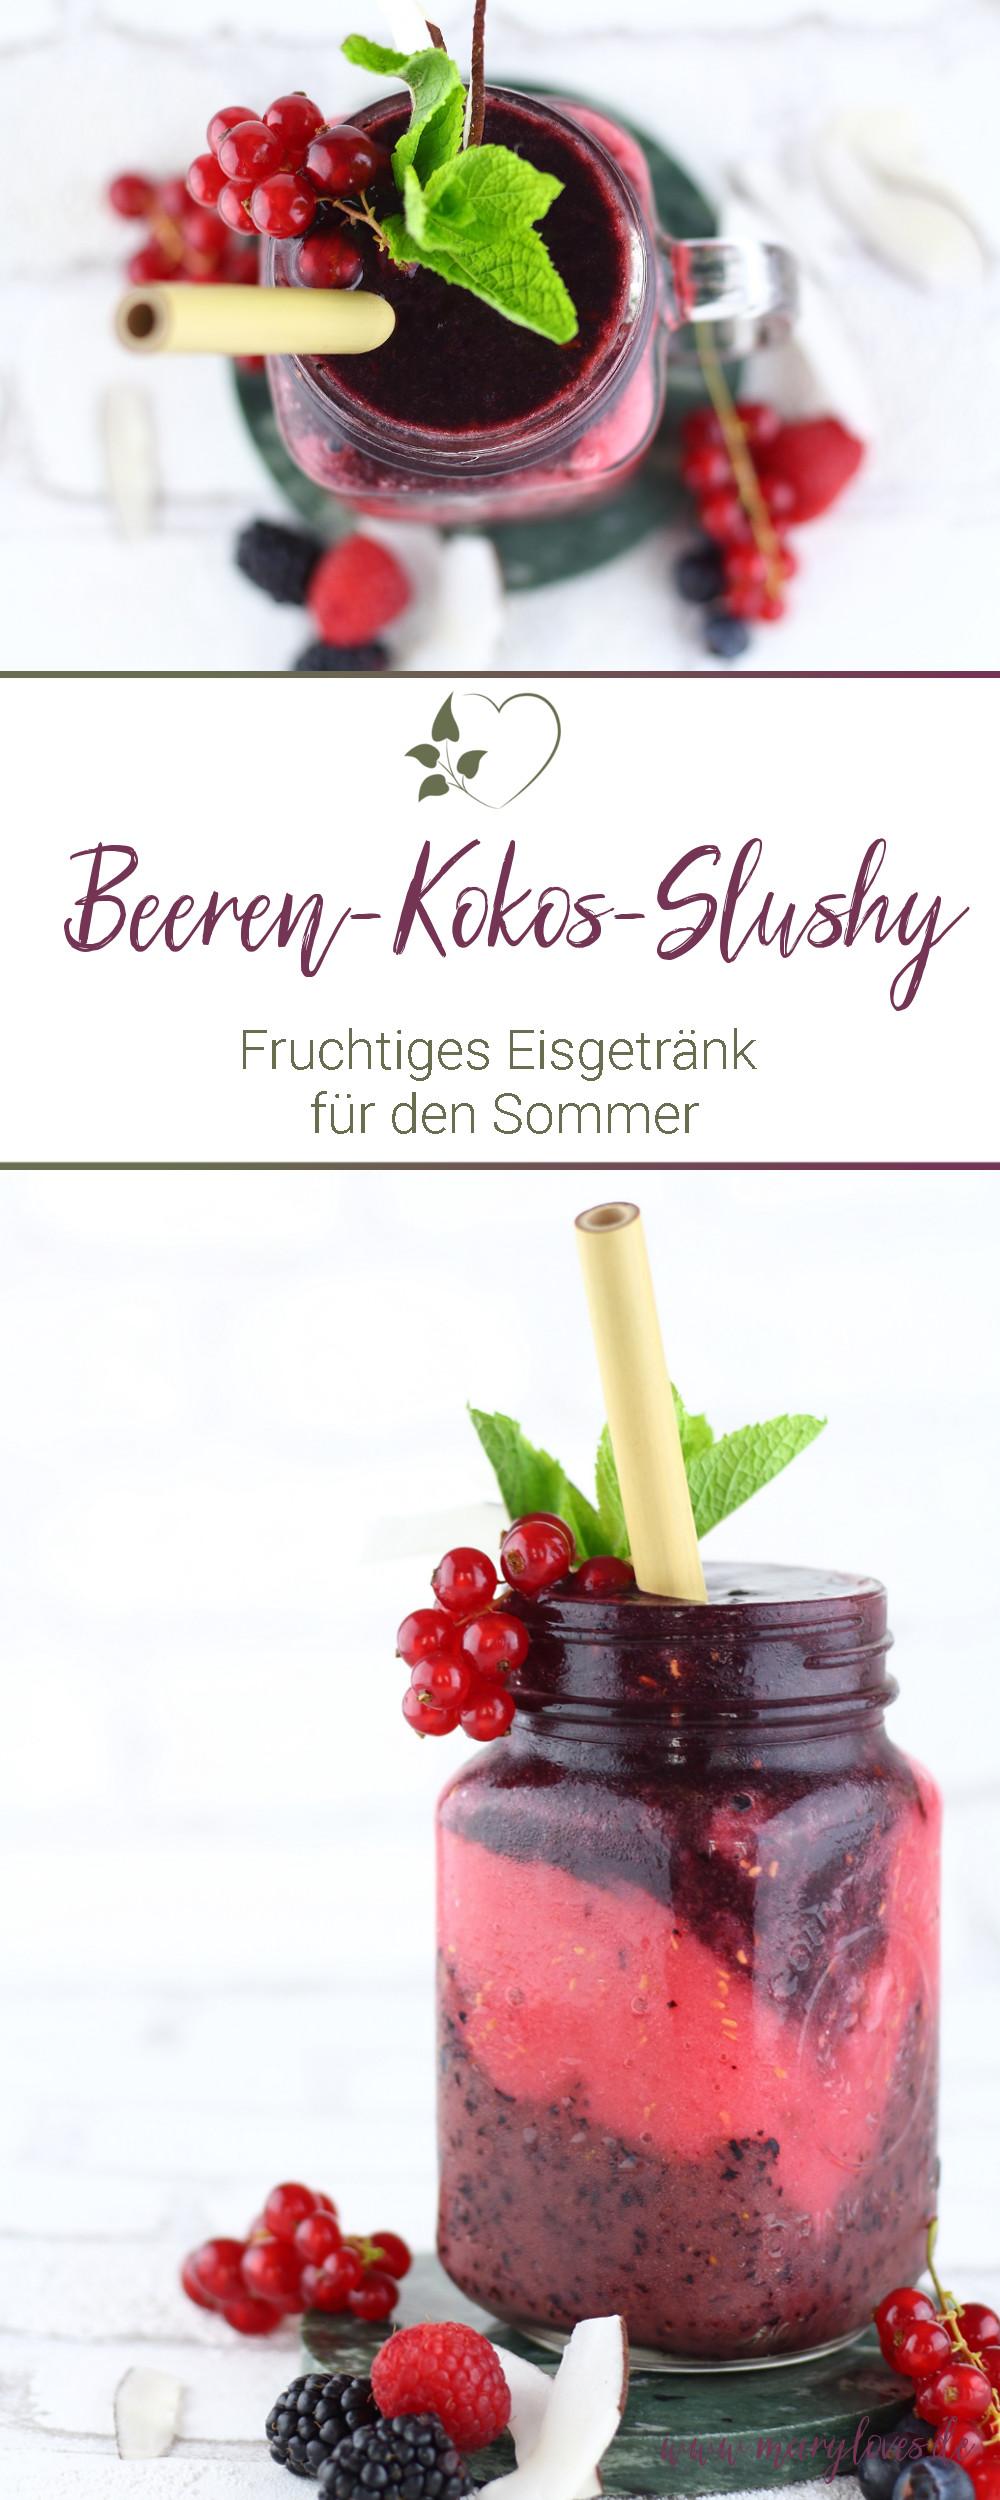 Fruchtiges Eisgetränk - Beeren-Kokos-Slushy - #slushy #slusheis #beerenslushy #slushyselbermachen #zuckerfrei #vegan #eisgetränk